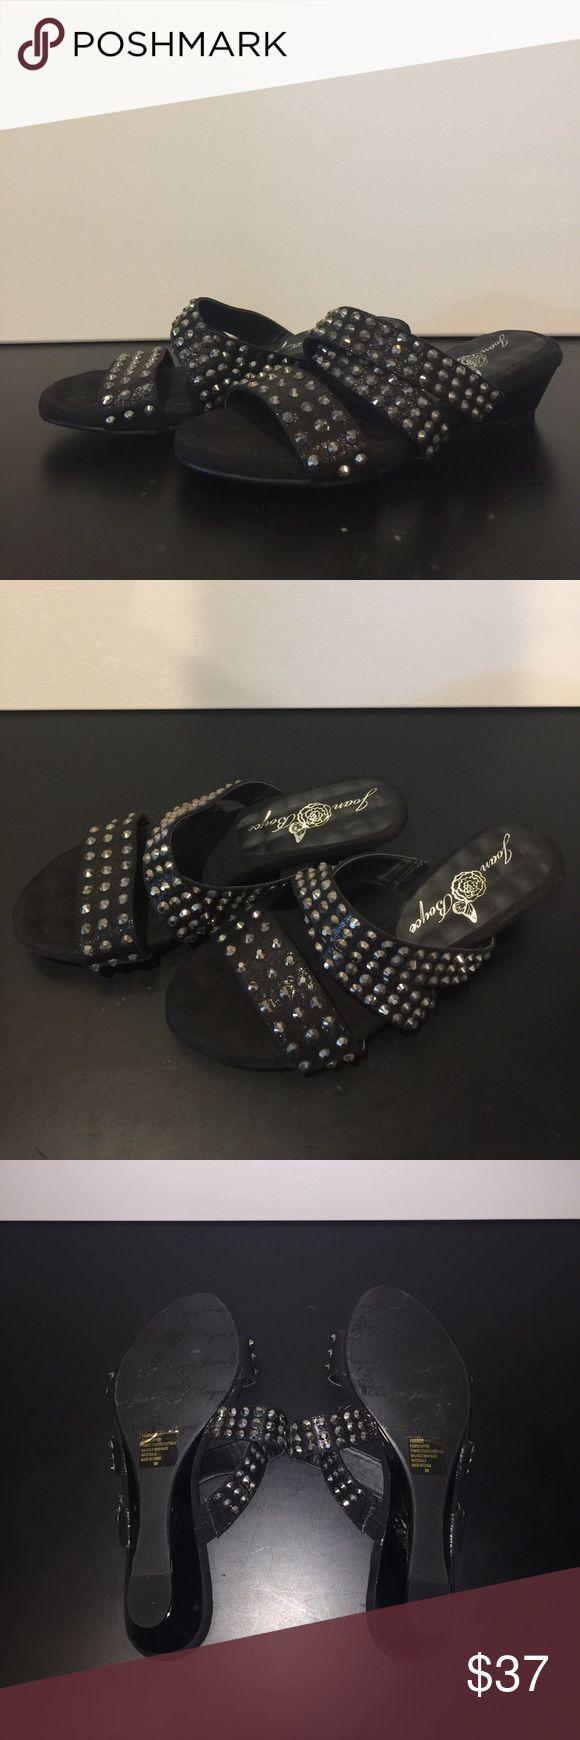 Black sandals littlewoods - Joan Boyce Black Blingtastic Low Wedge Sandal 8w